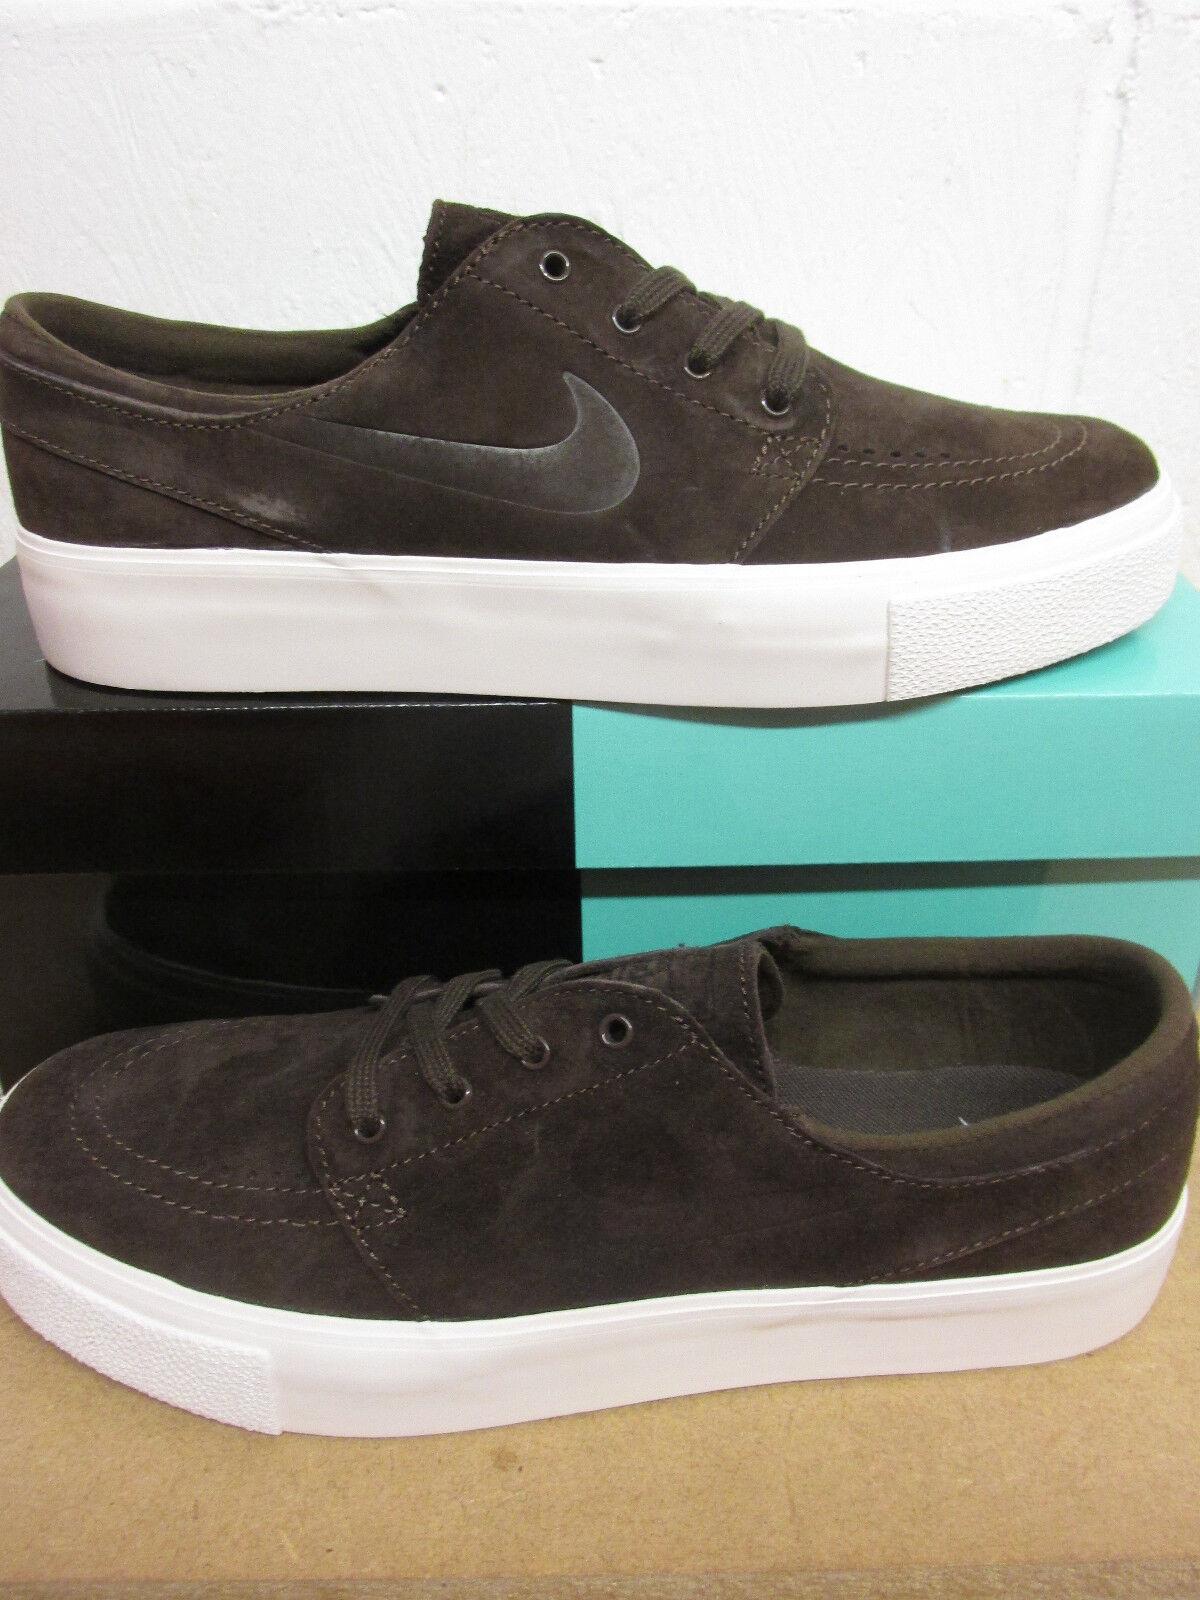 Nike SB Zoom Stefan Janoski PREM HT Mens Trainers 854321 221 Sneakers Shoes